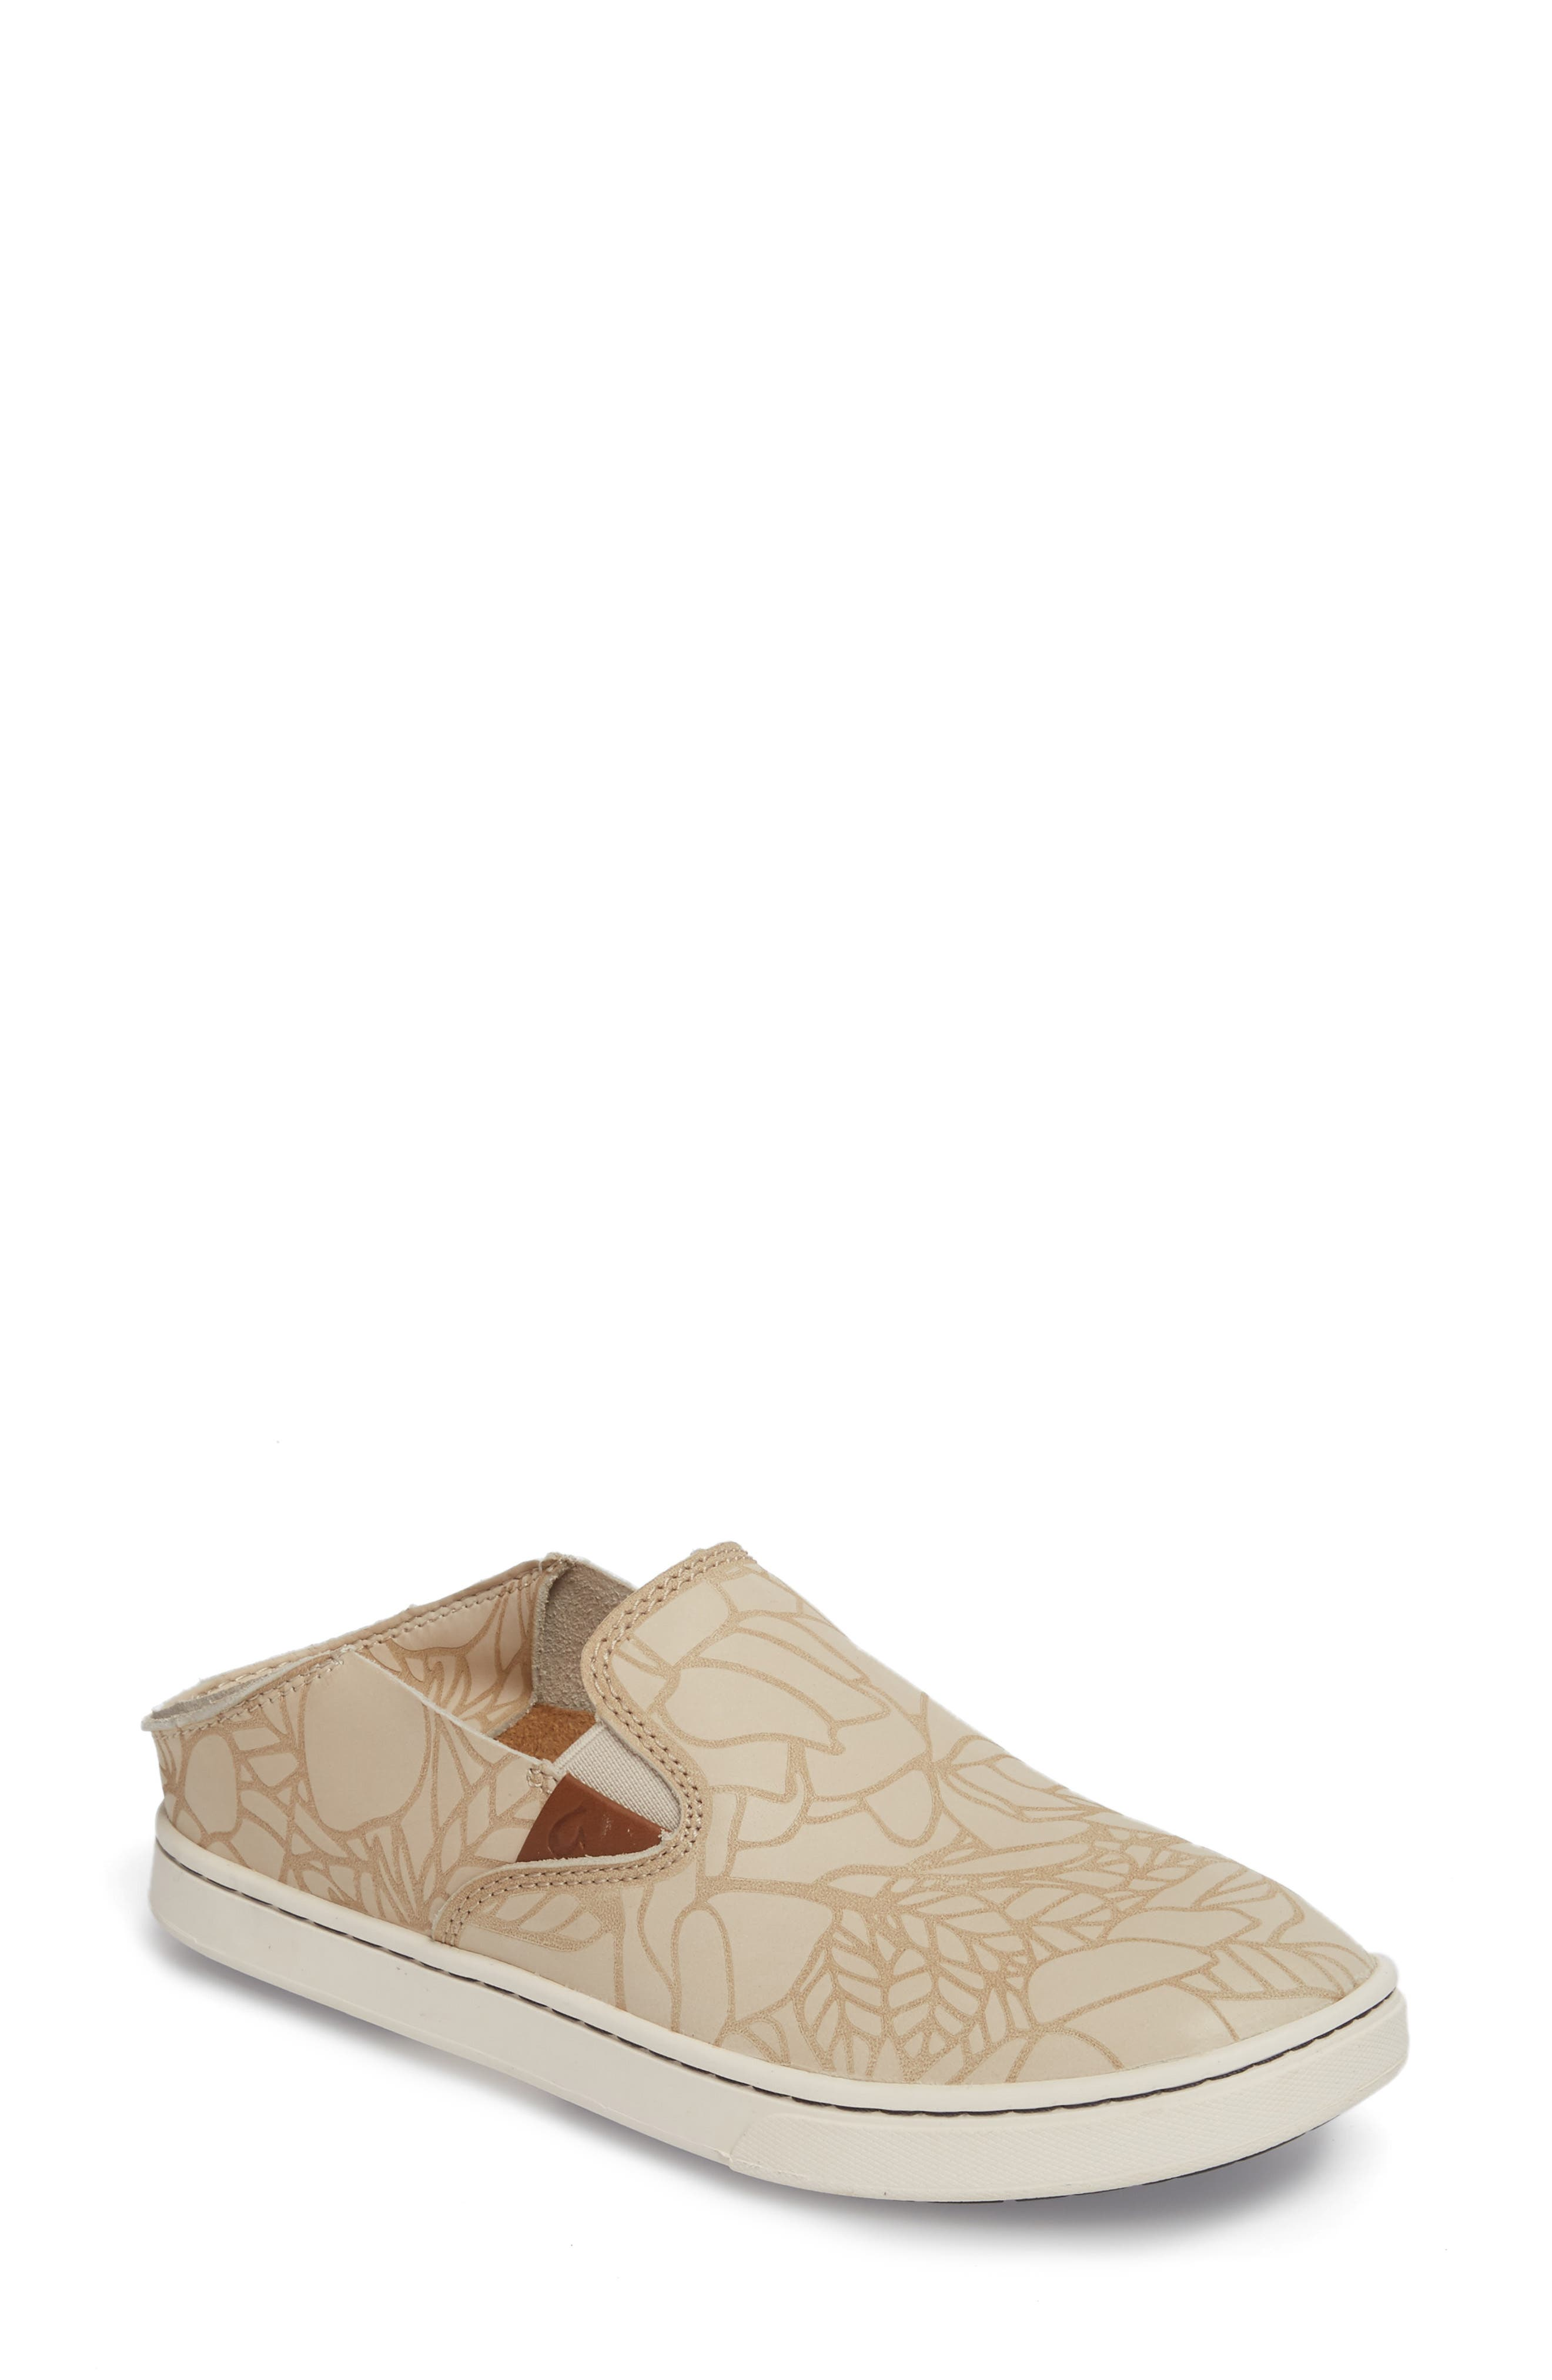 Olukai Pehuea Lau Slip-On Sneaker, Beige